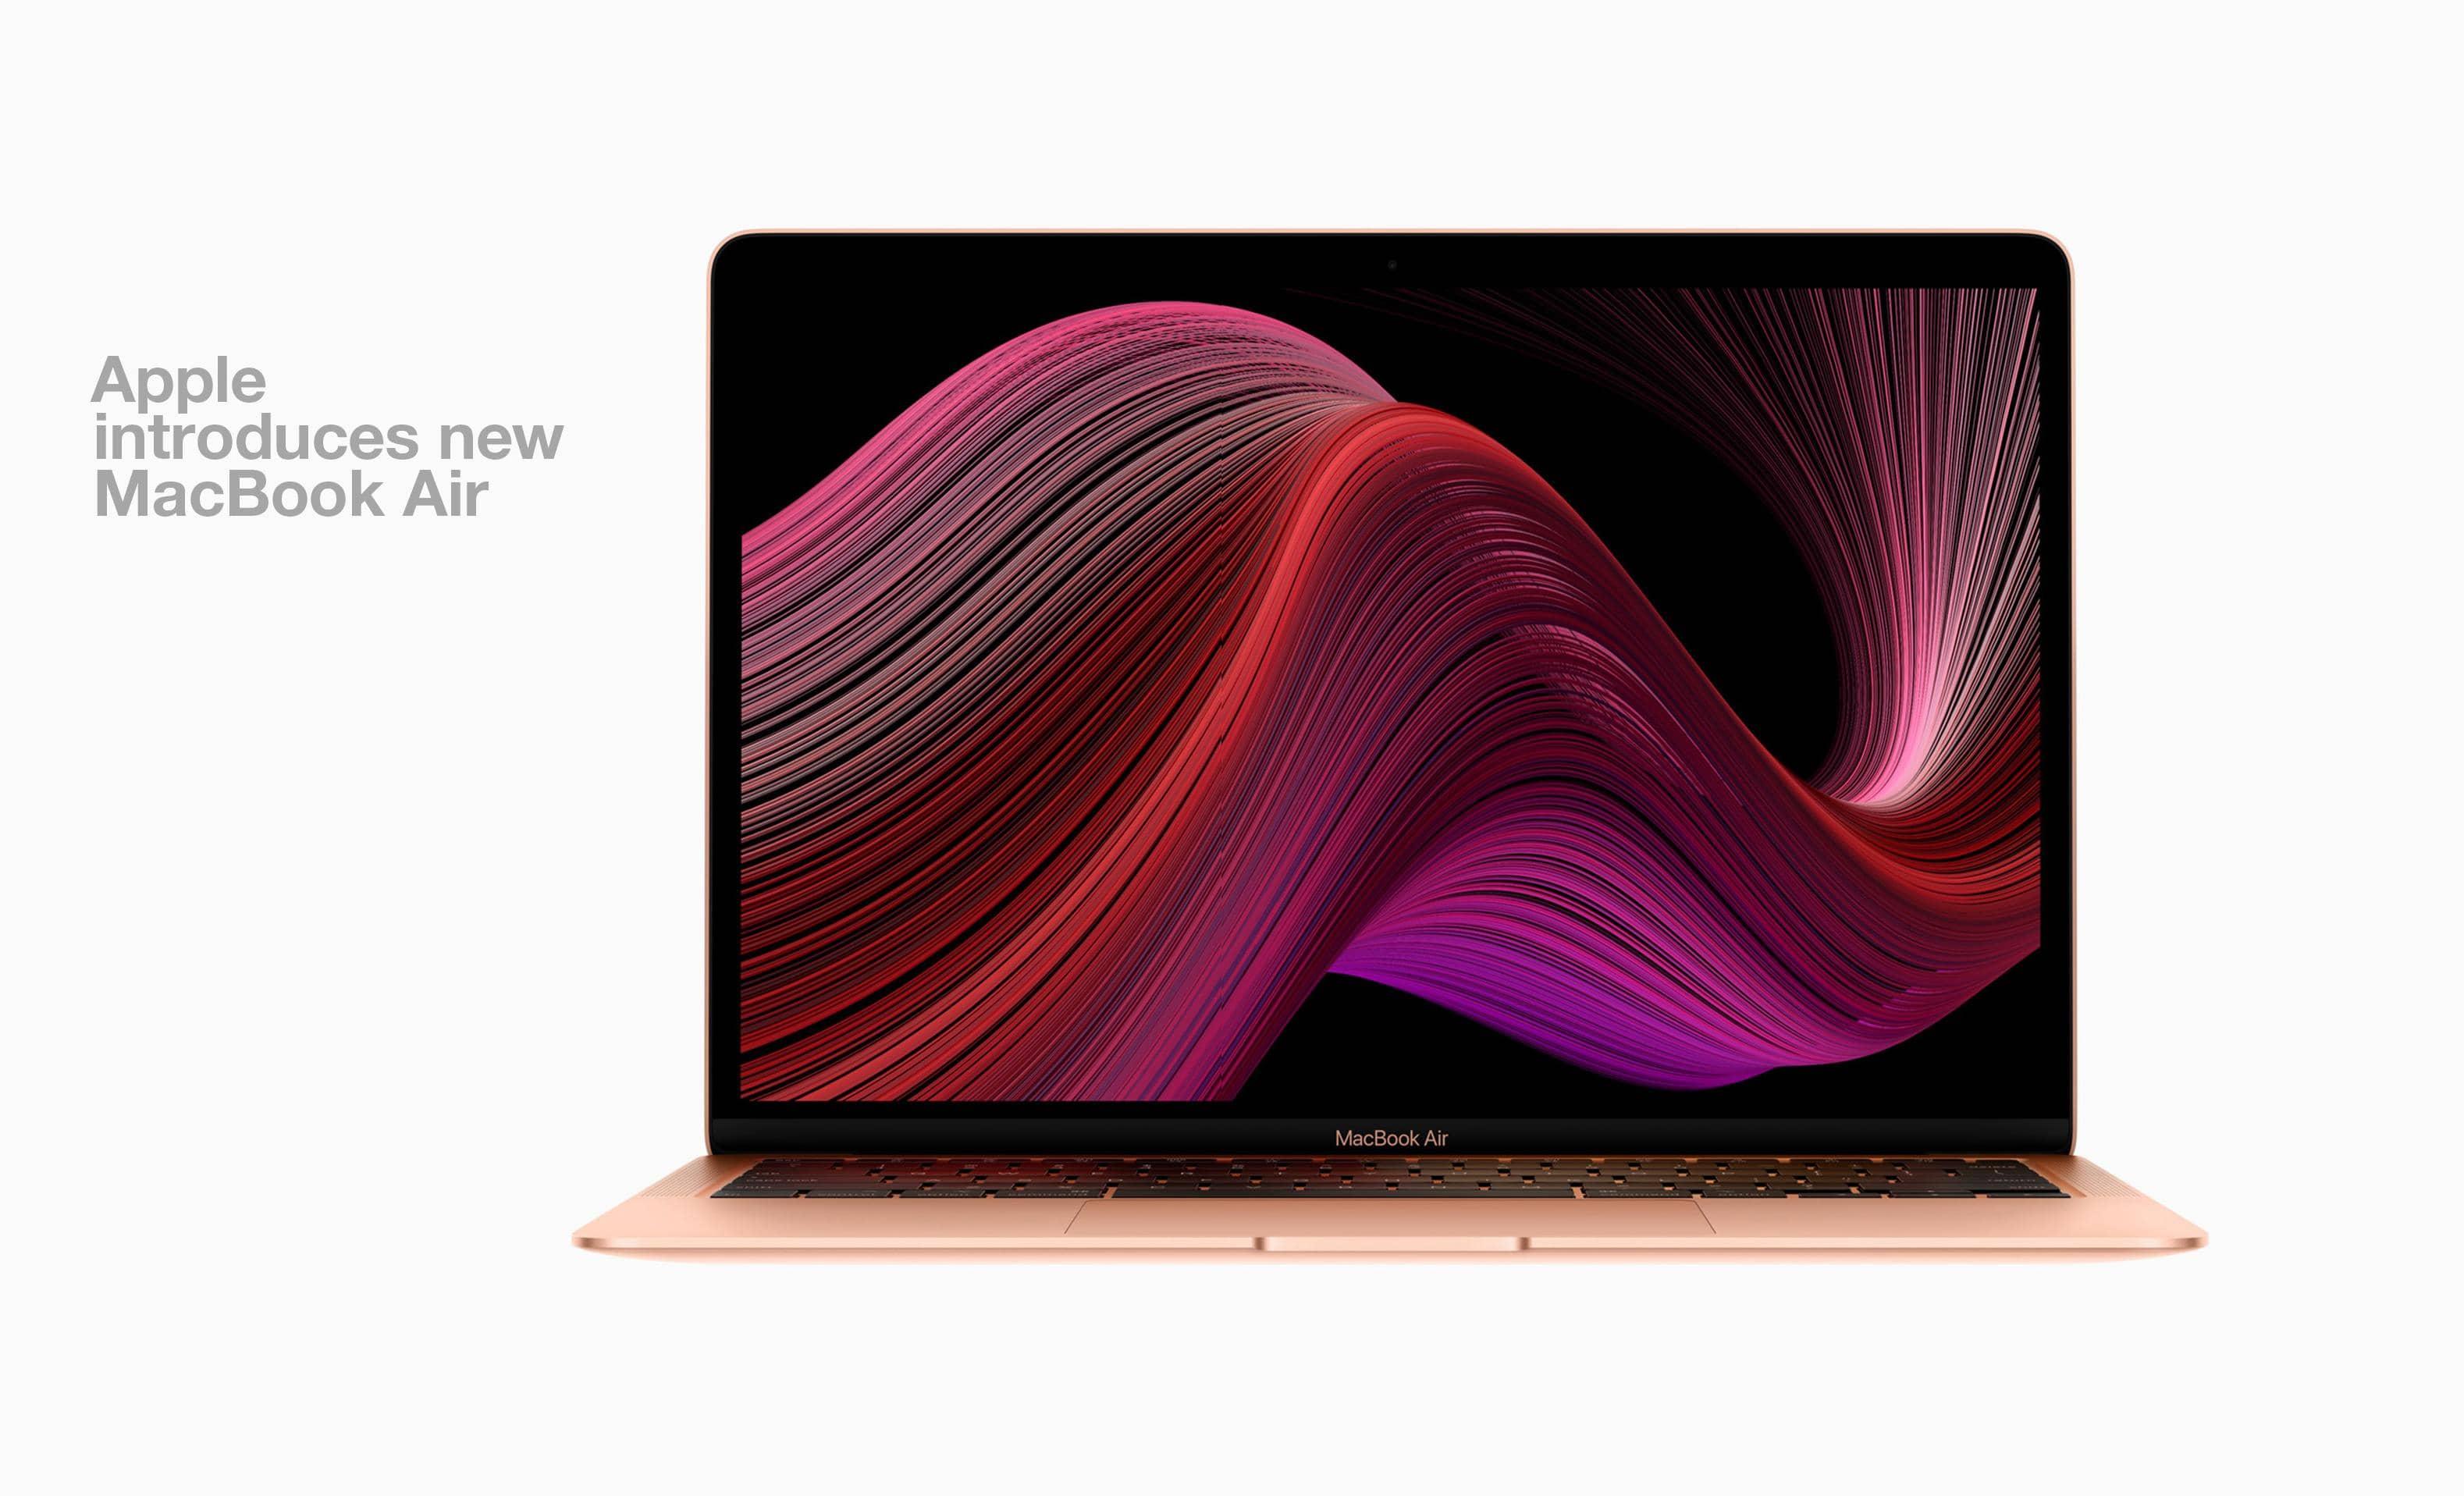 Apple introduces new MacBook Air